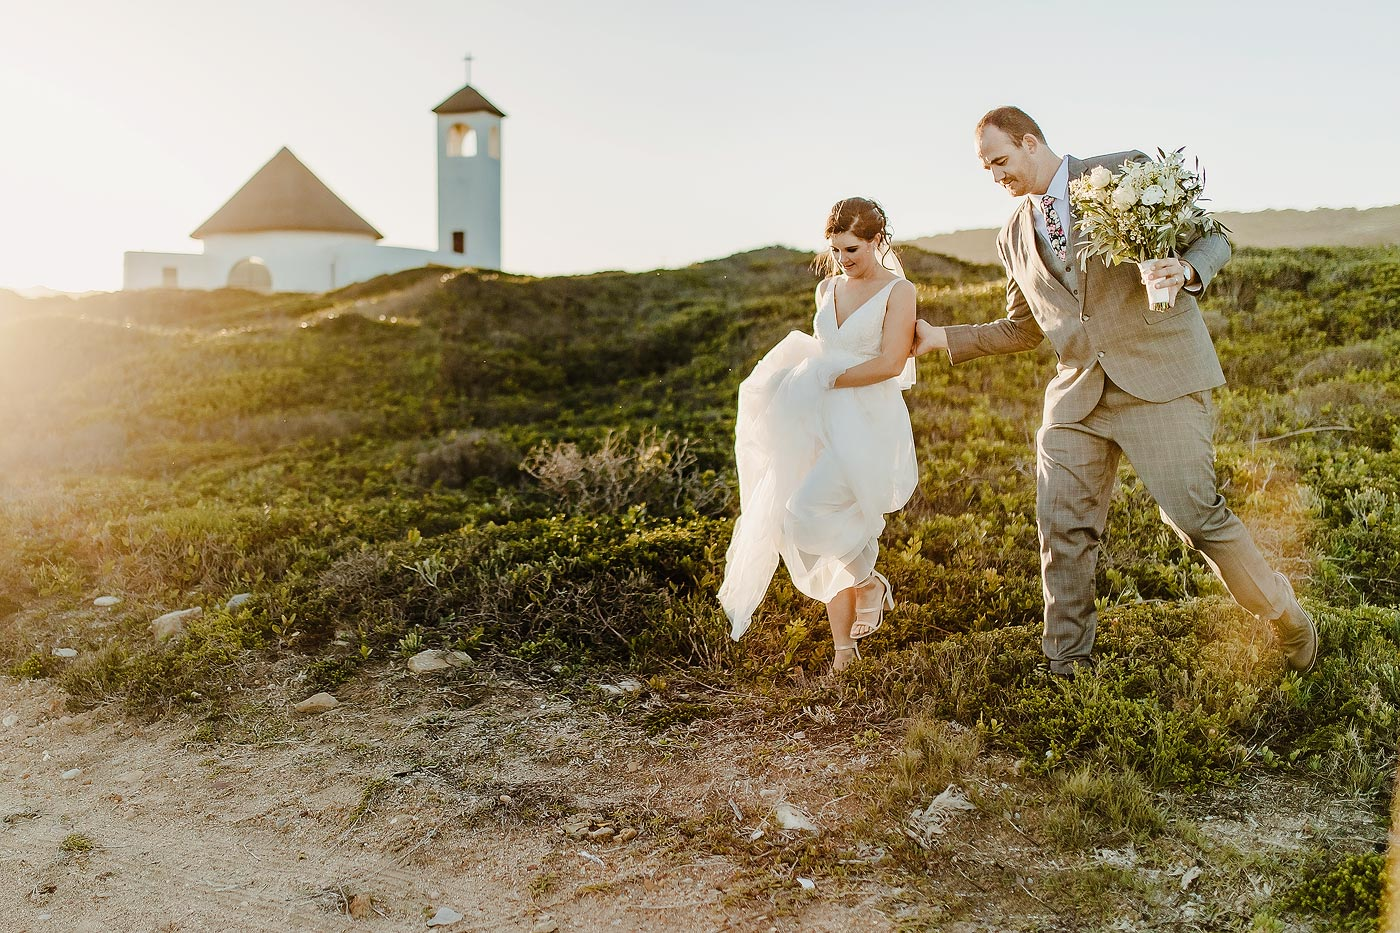 Copy of Bride and groom natural Photo between fynbos at the Ocean.